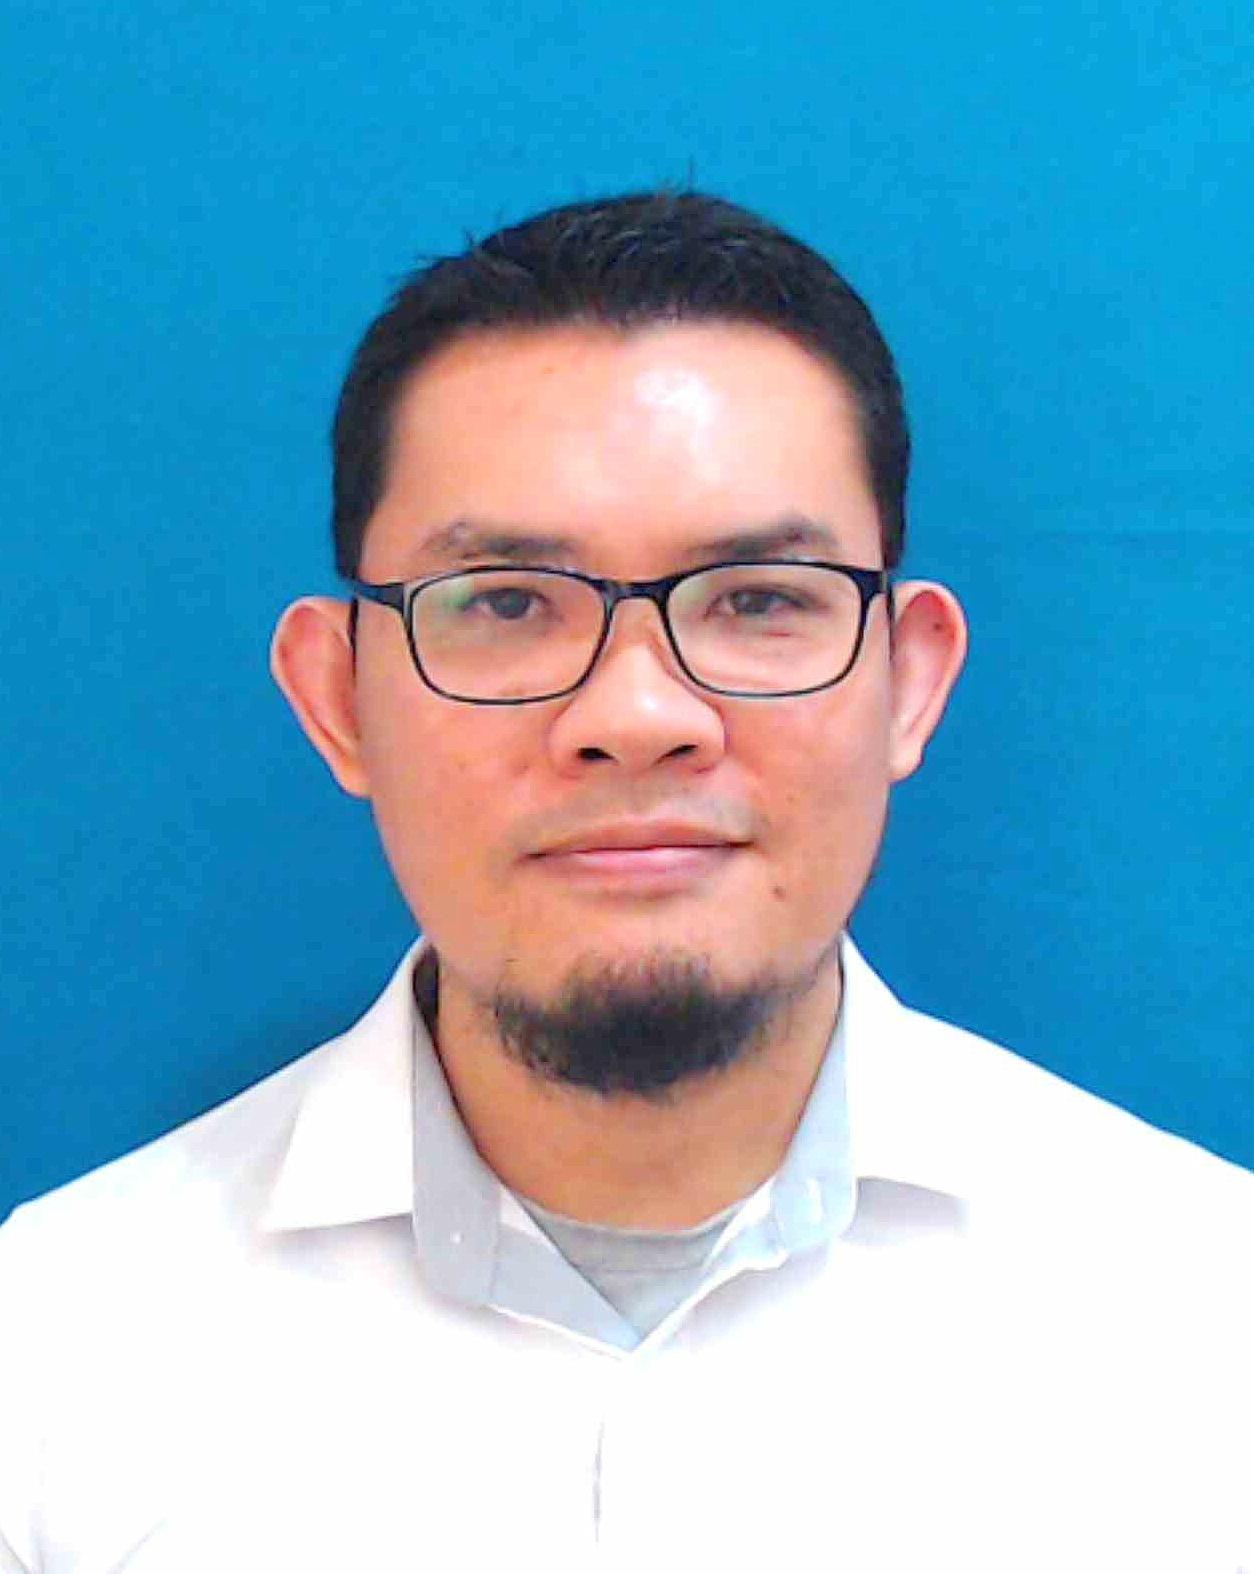 Ahmad Fahmi Bin Harun @ Ismail